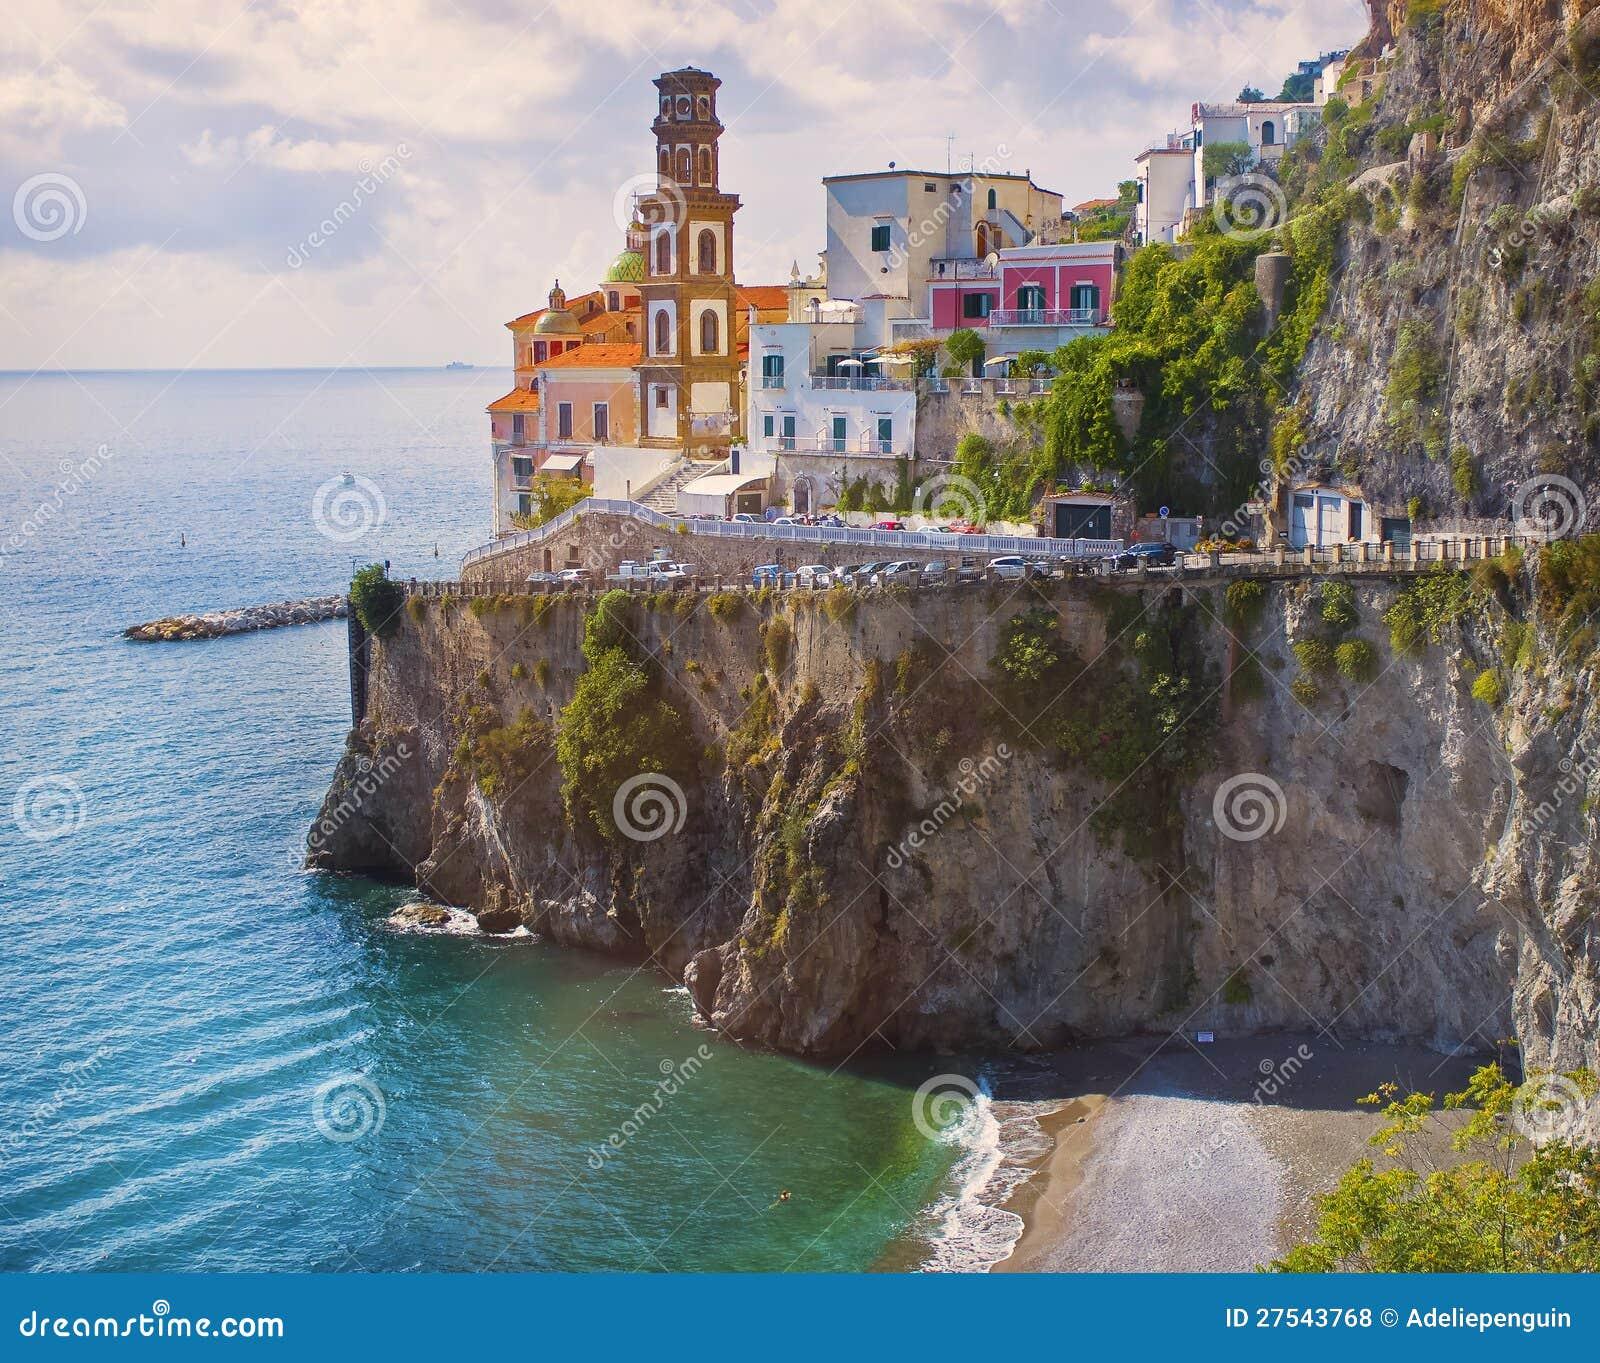 Cliffside村庄,阿马飞海岸,意大利